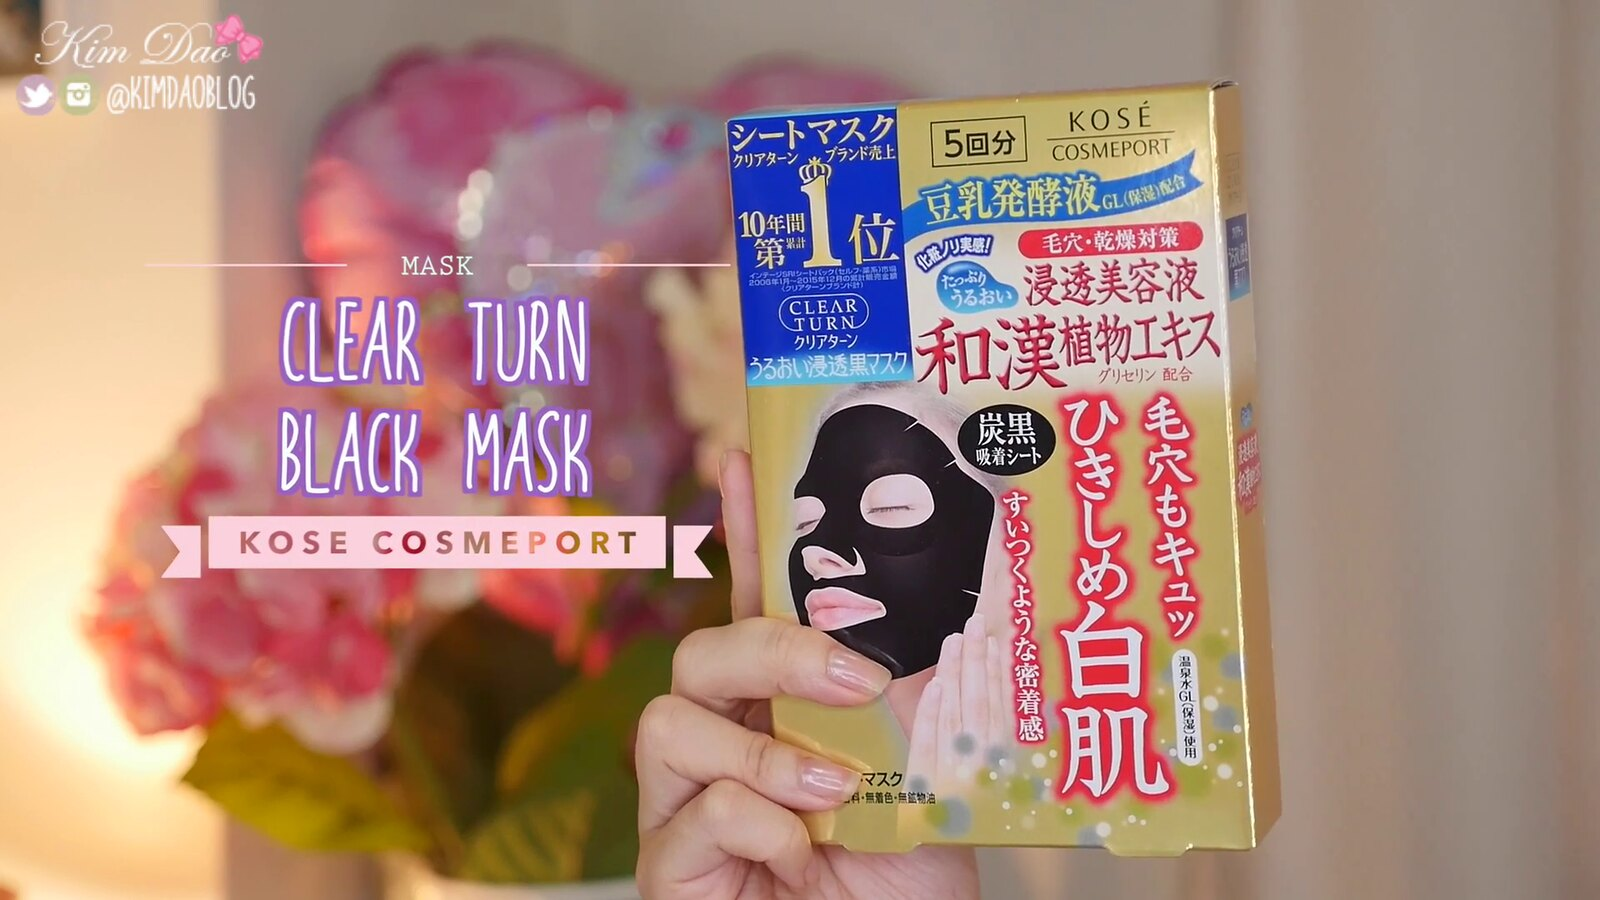 Top 10 Japanese Skincare Kose Cosmeport Kim Dao